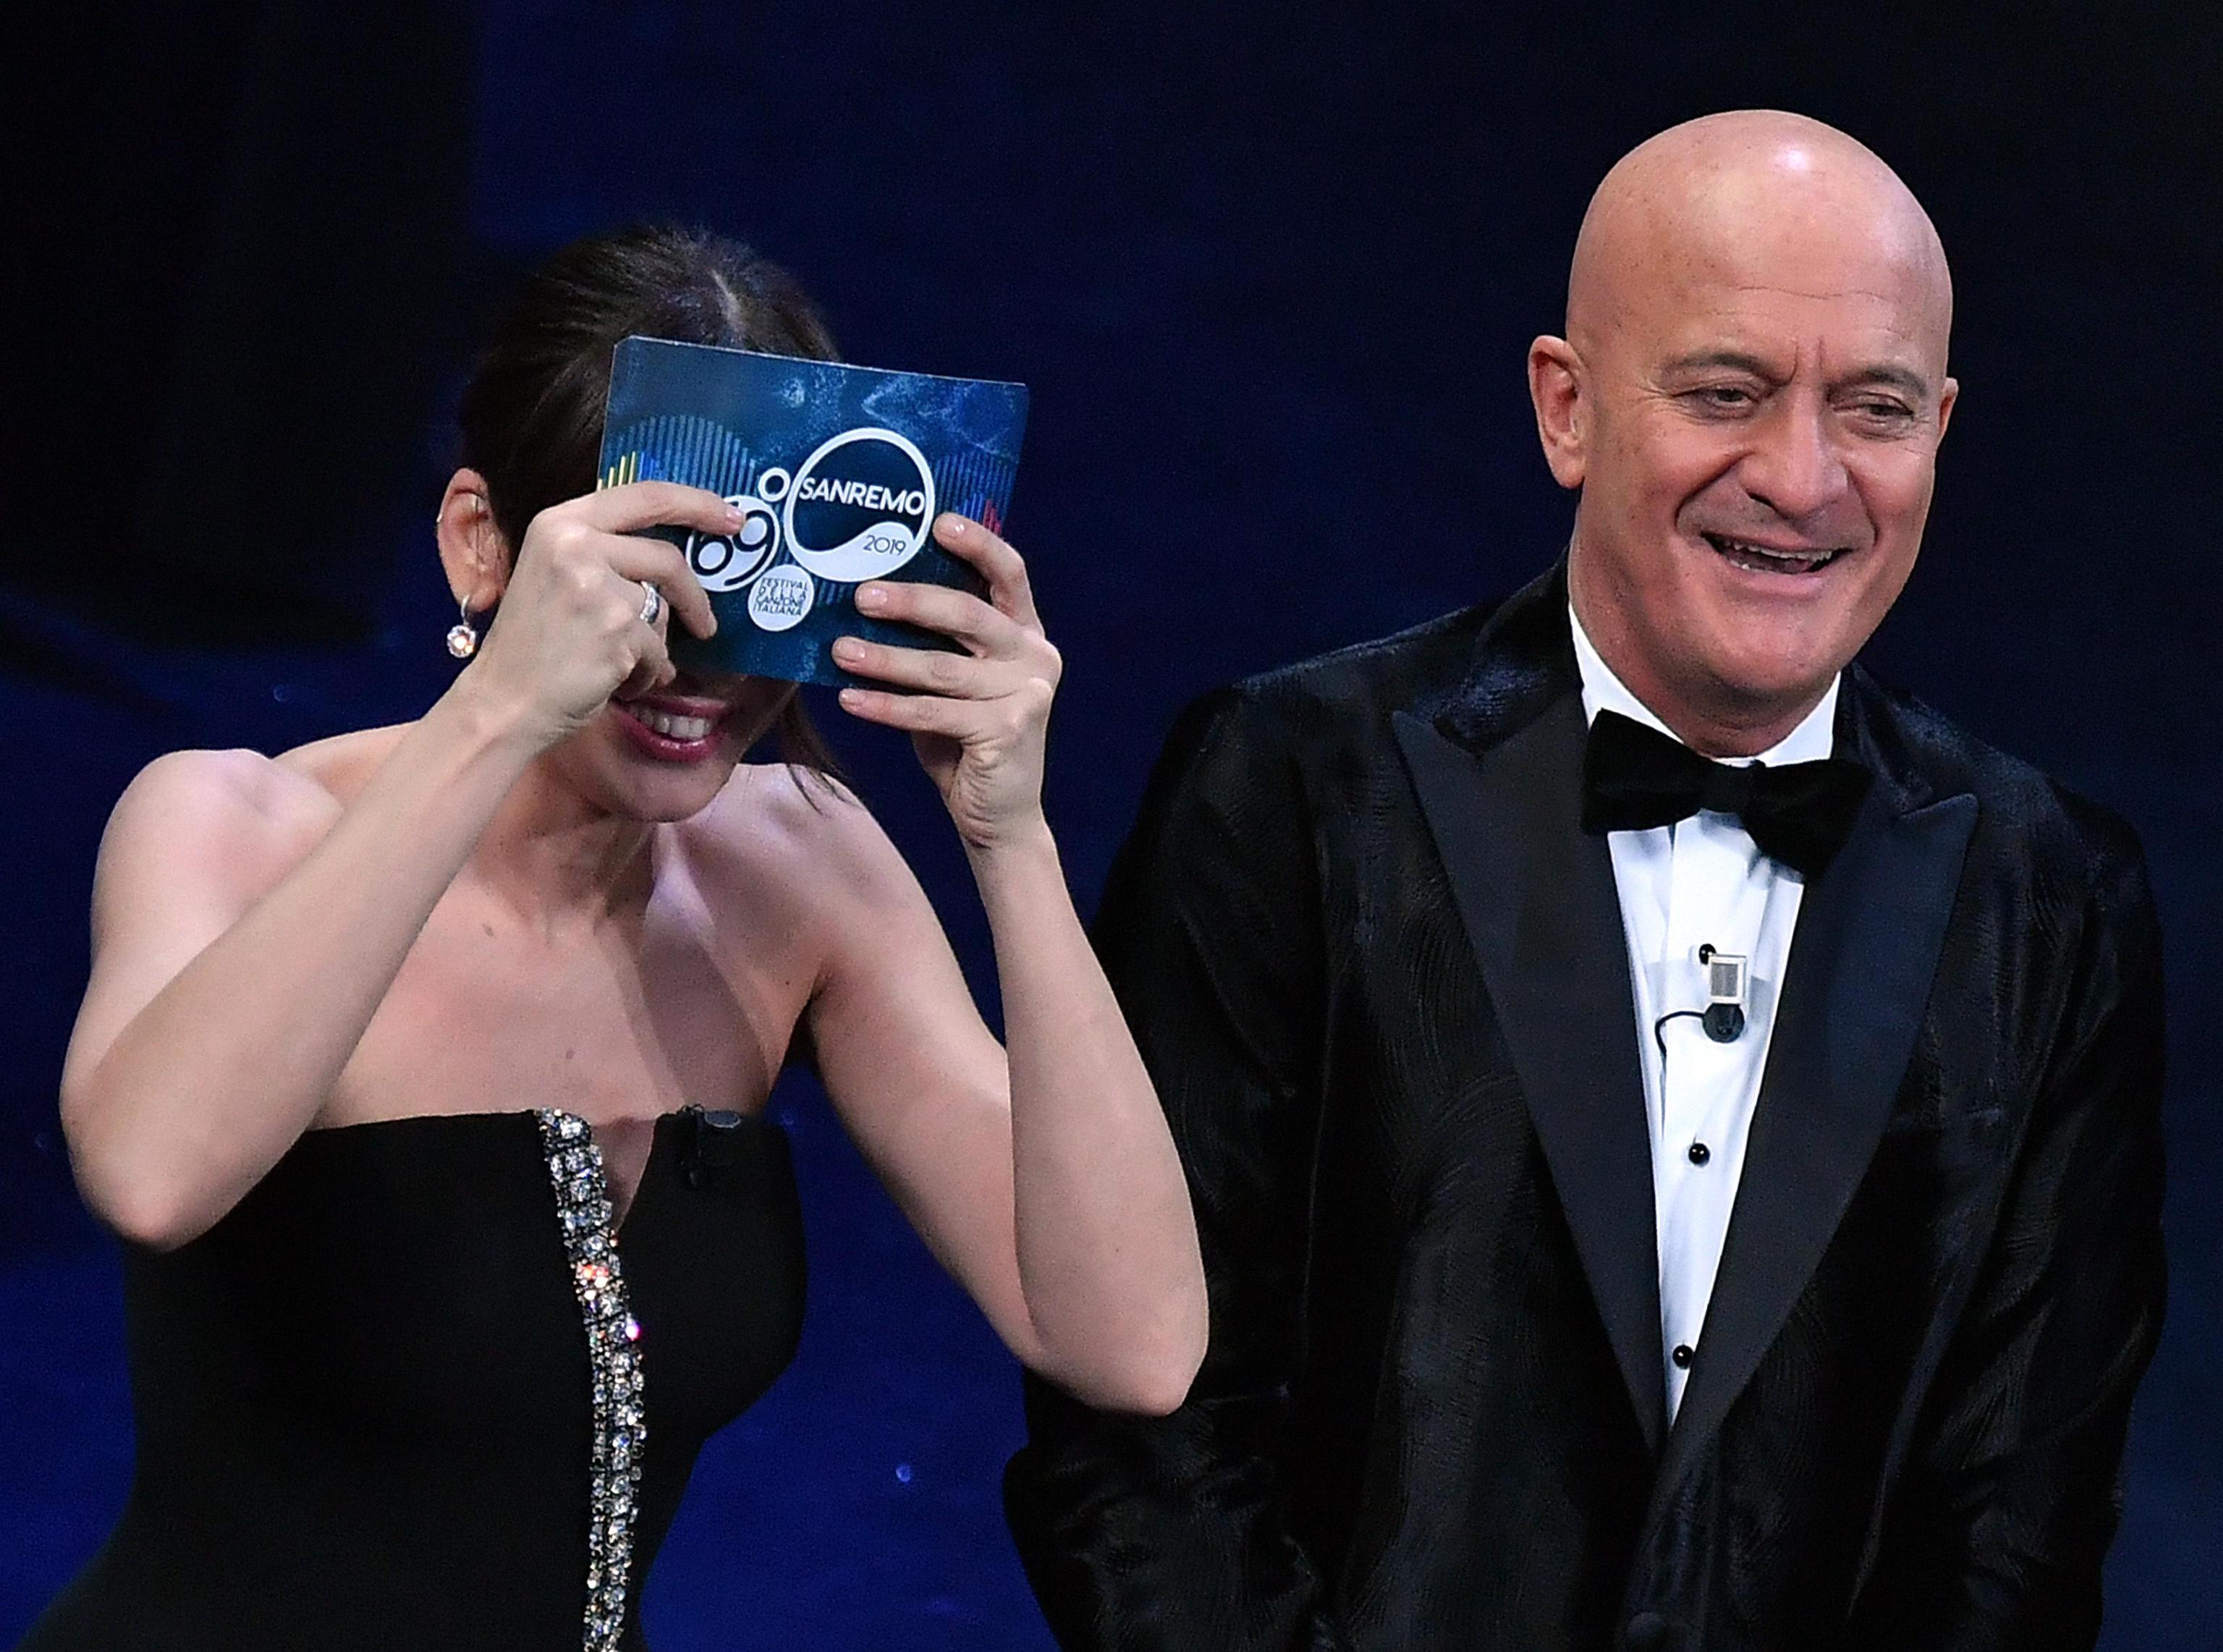 Sanremo 2019, la gaffe di Virginia Raffaele: 'Salutiamo i Casamonica'